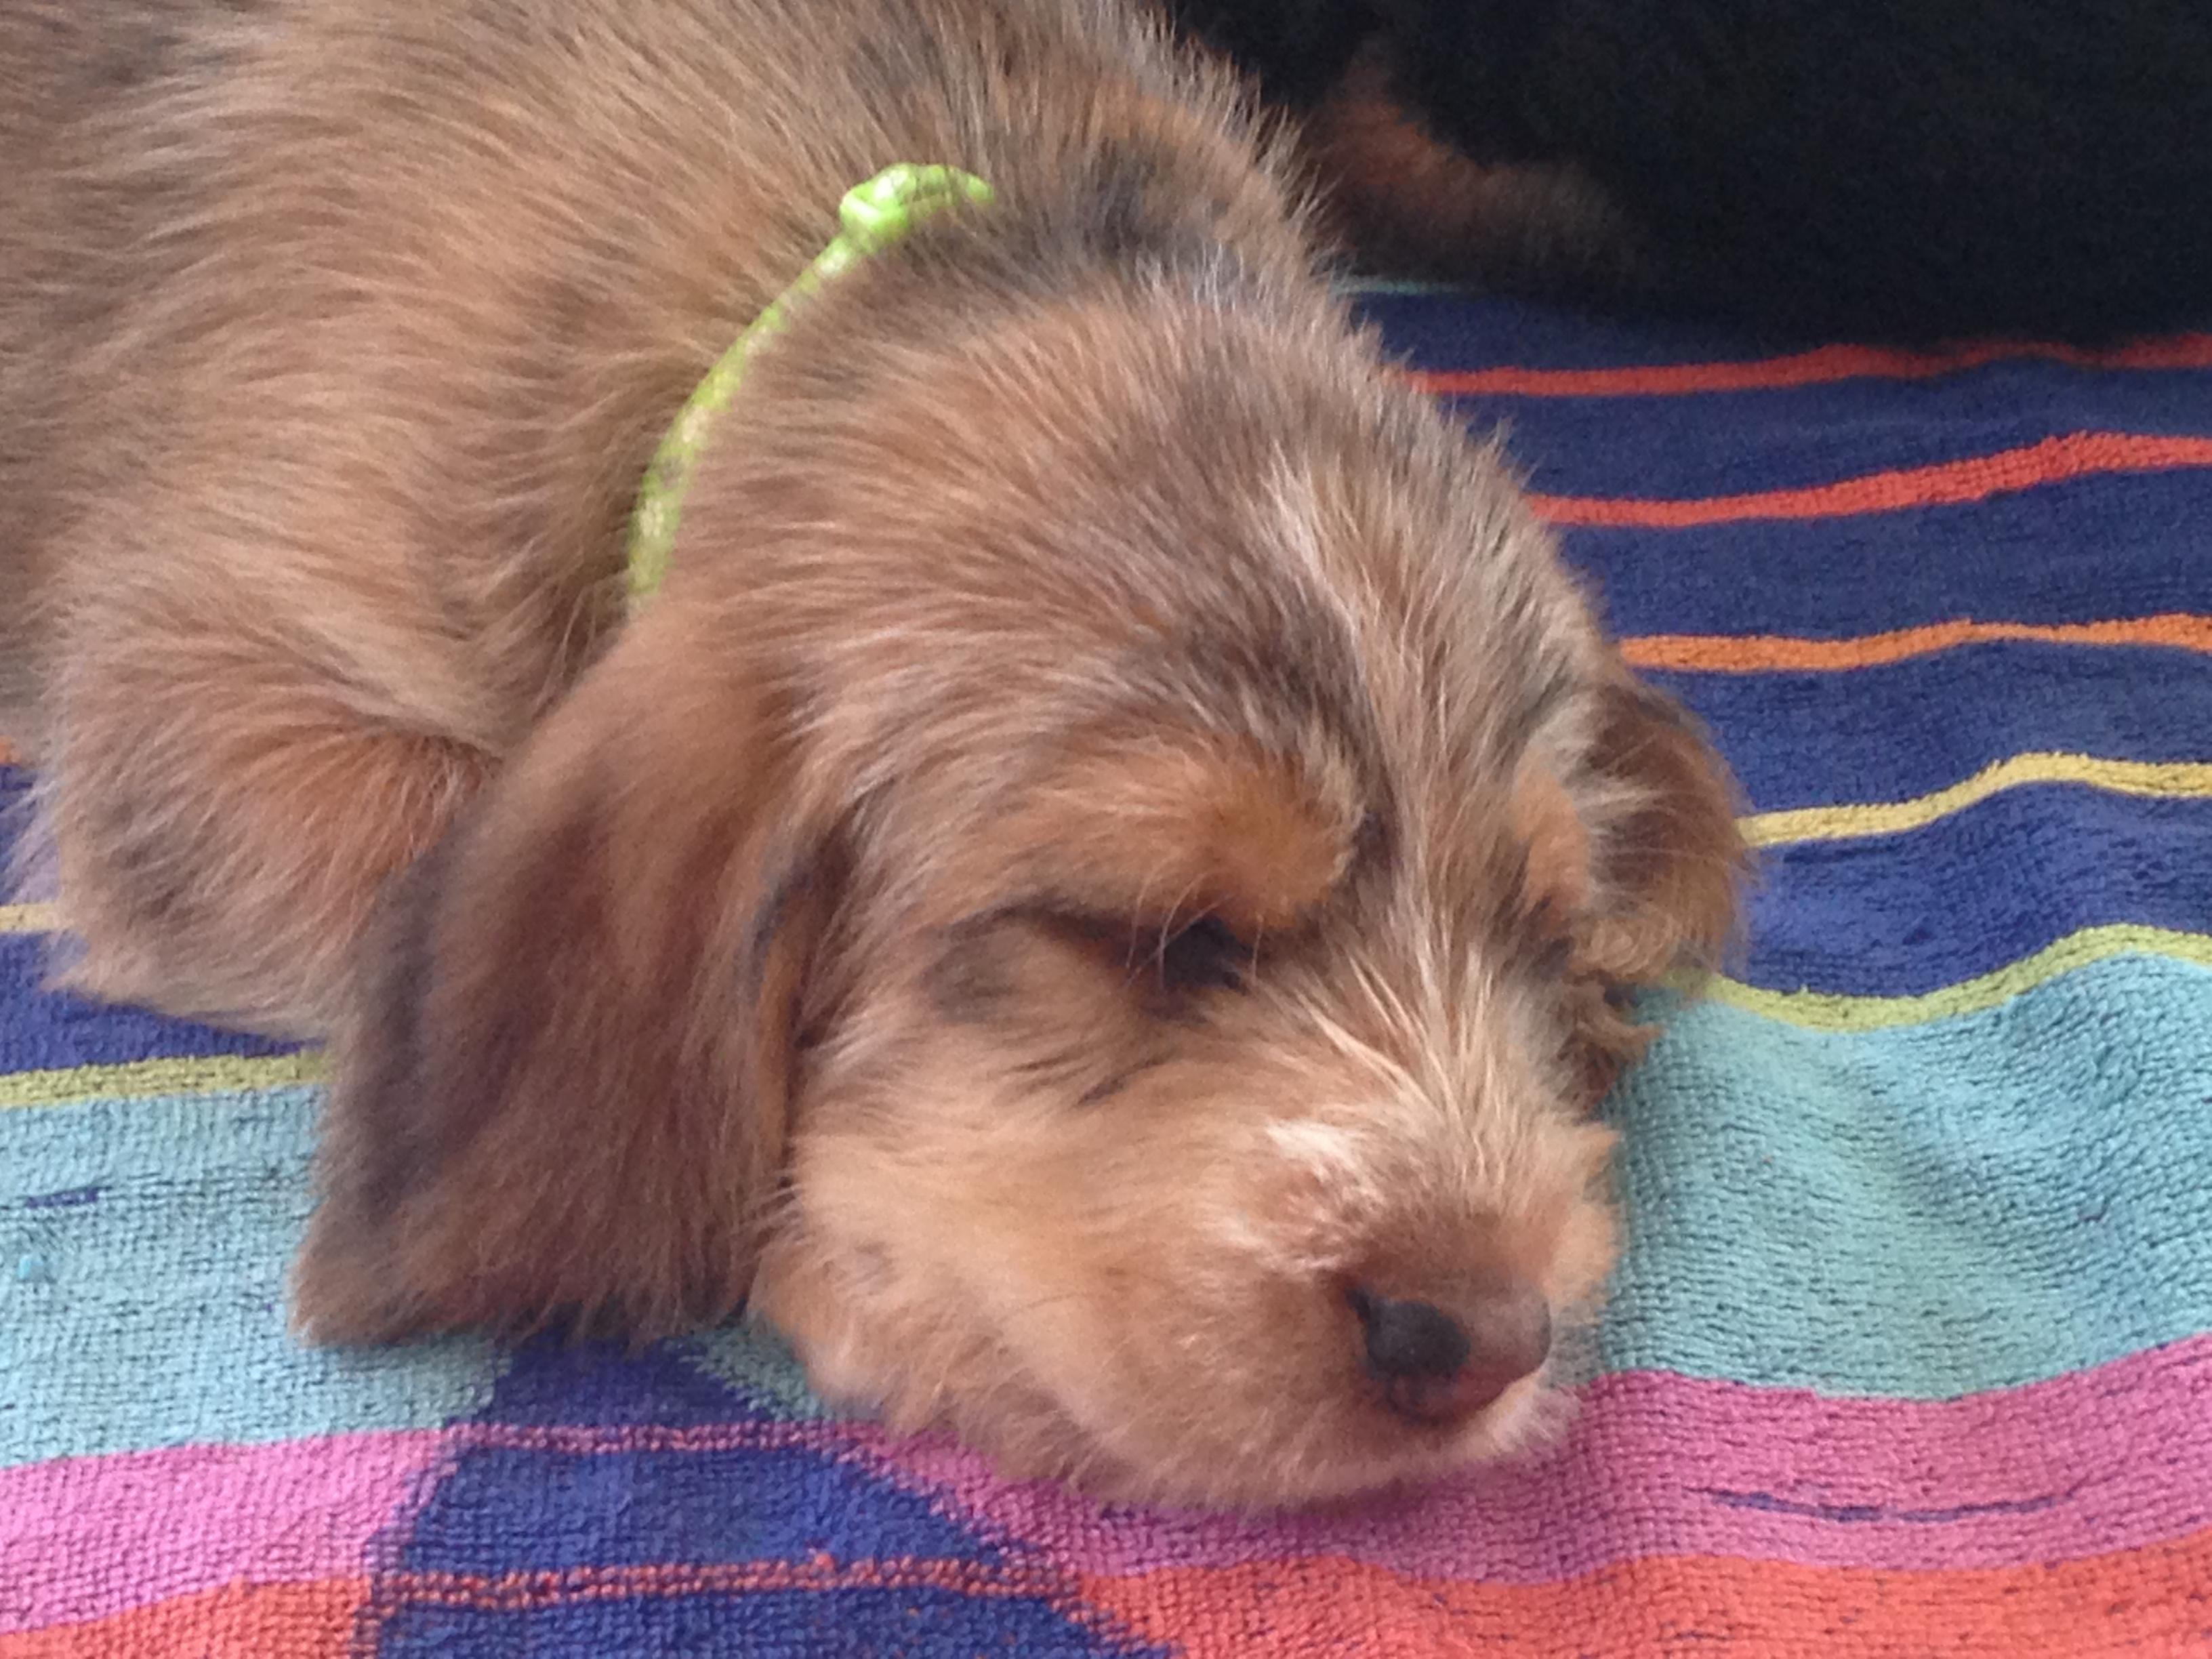 Blue Fairy Otterhound Puppies 2016: Day 38   Blue Fairy ...